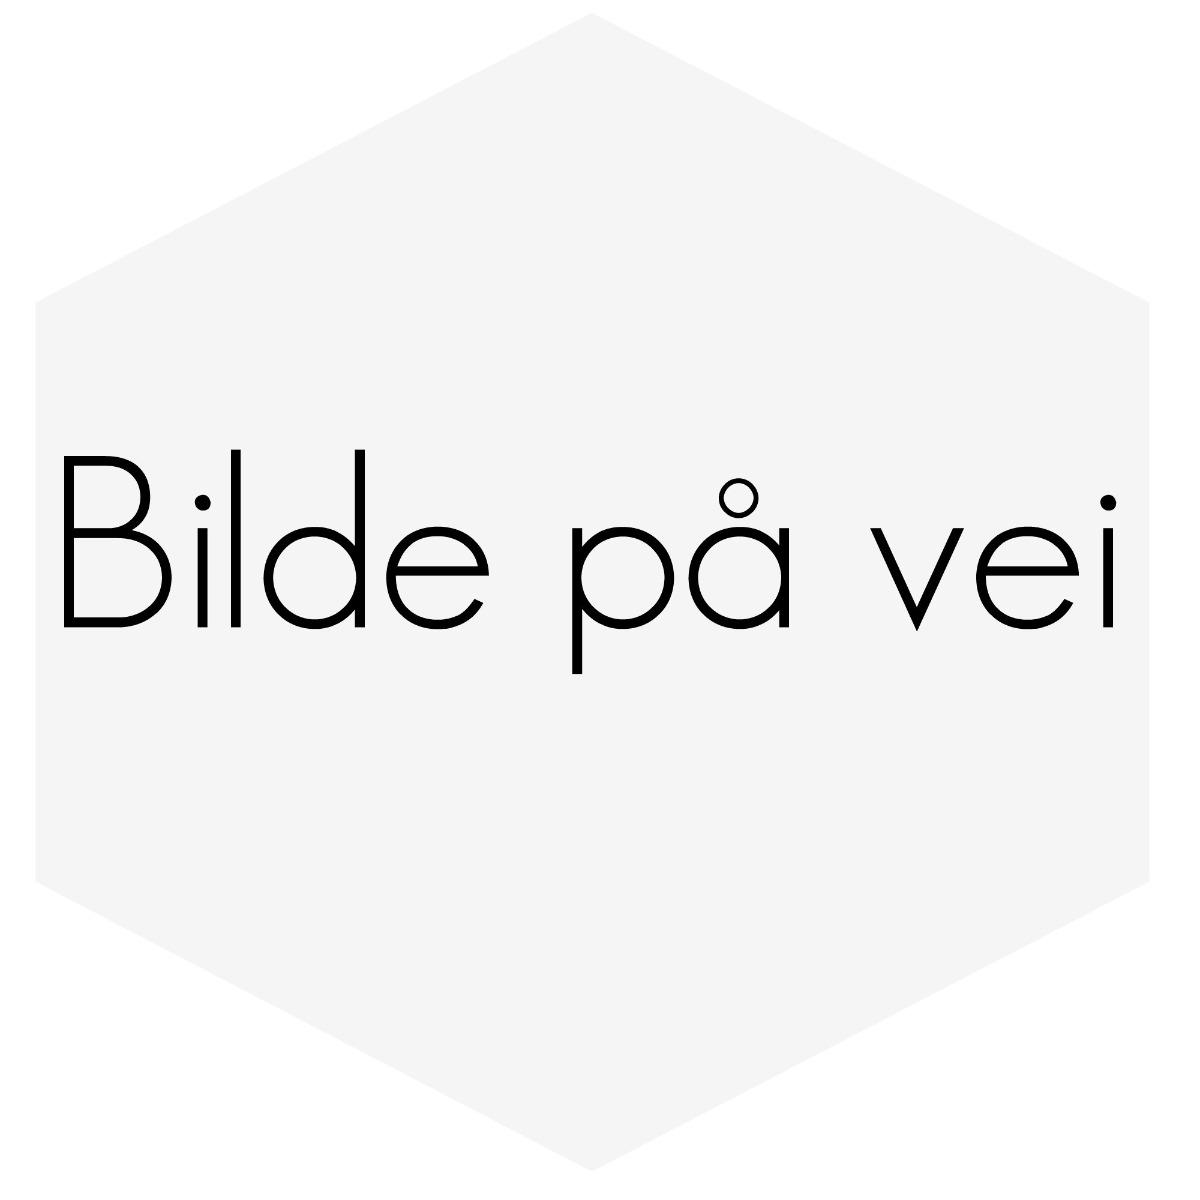 STØTDEMPER FORAN VOLVO XC70N 01-07 MOD.